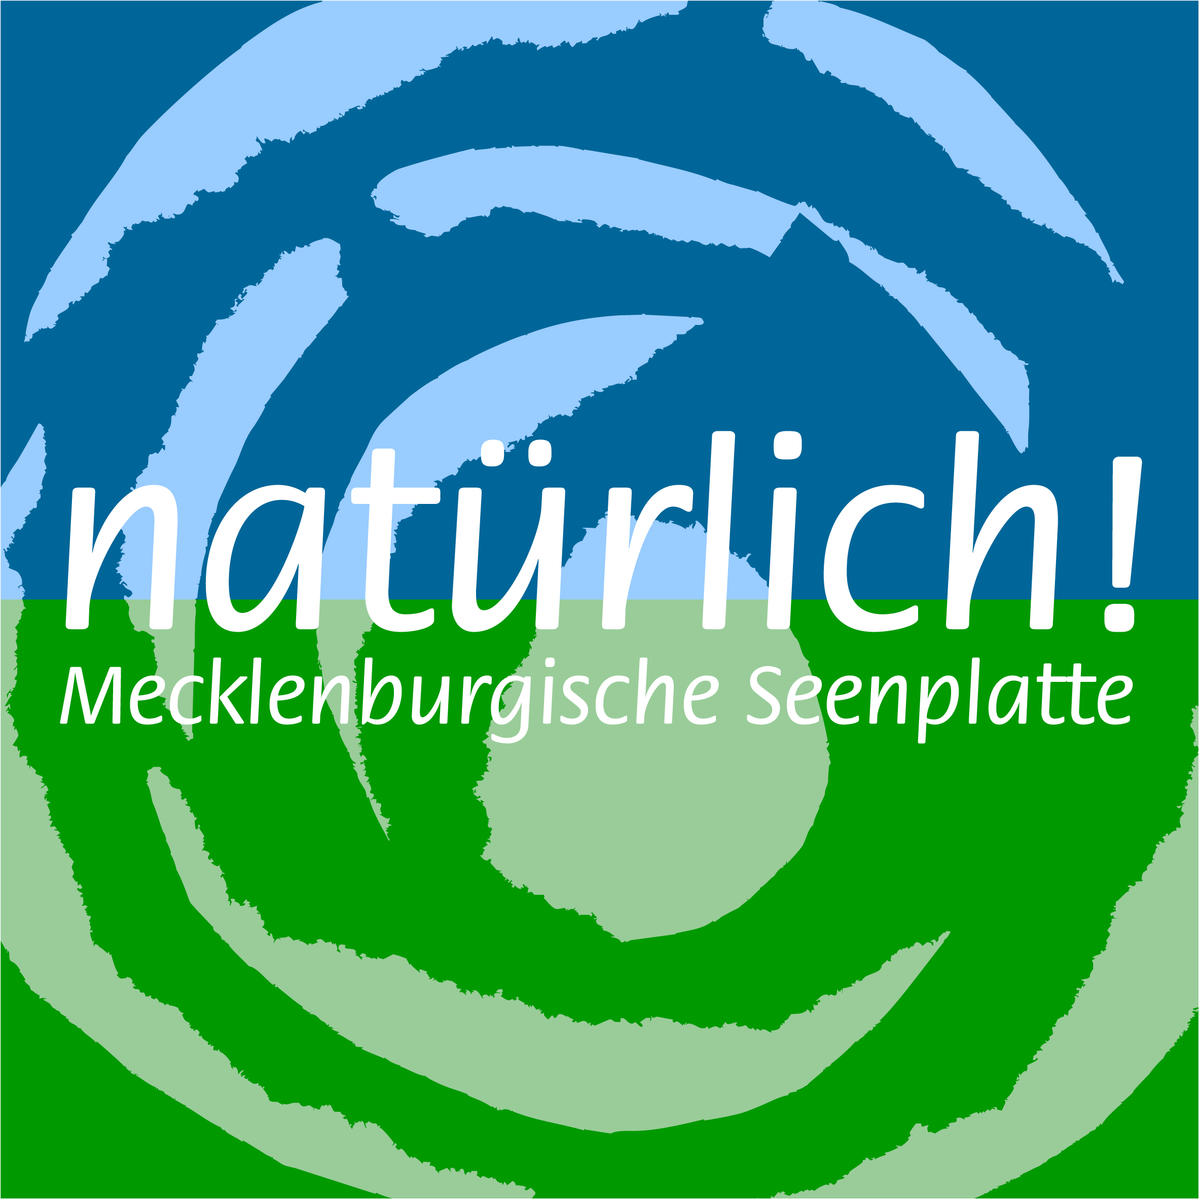 Mecklenburgische Seenplatte Karte Pdf.Downloads Regionaler Planungsverband Mecklenburgische Seenpl